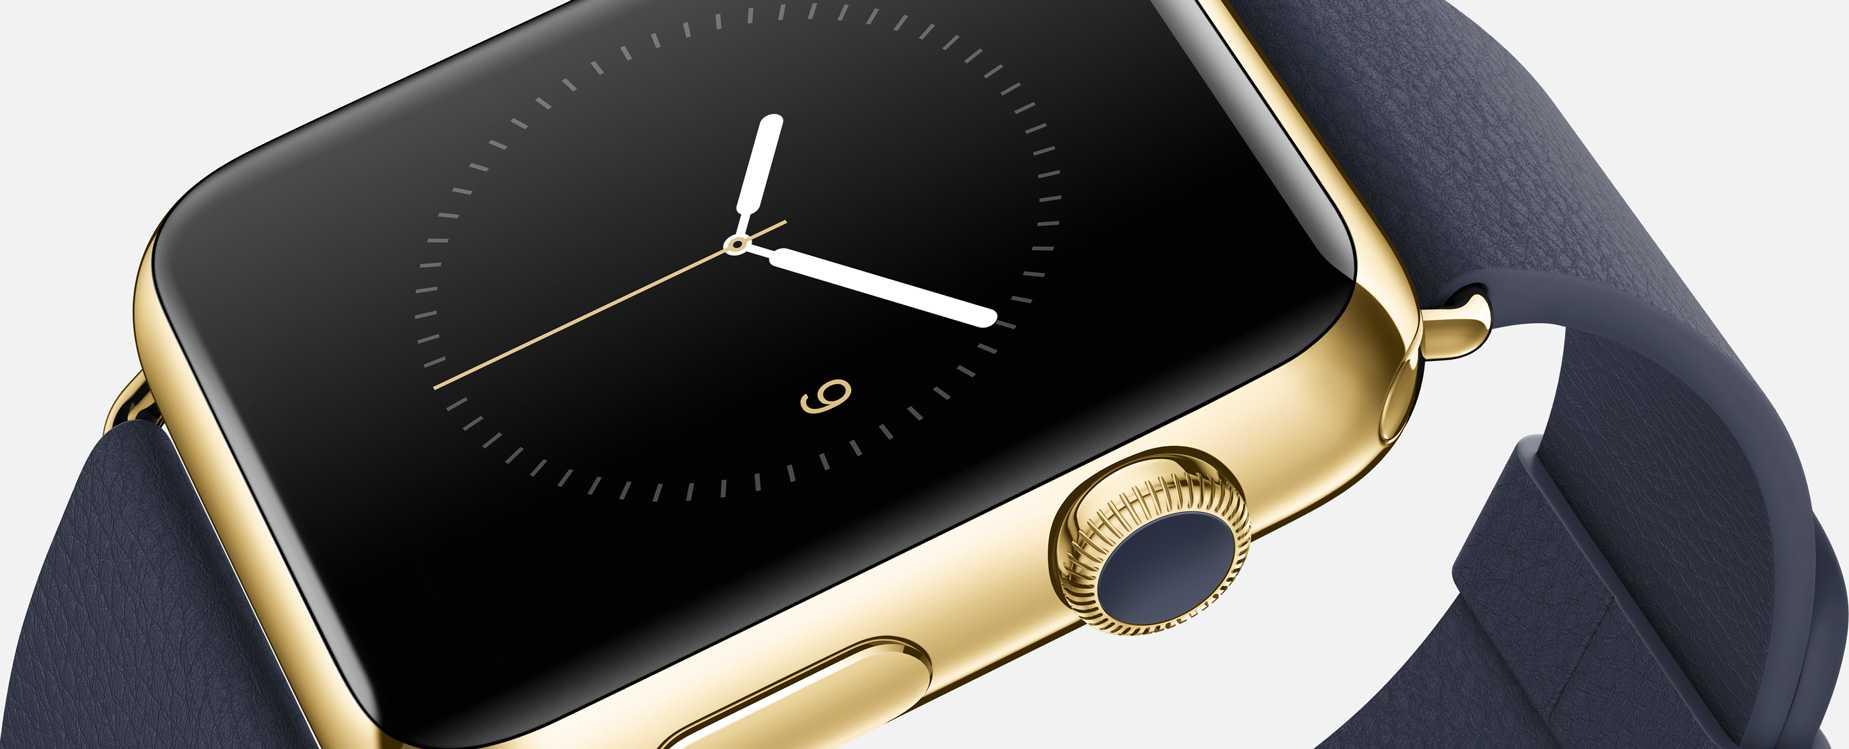 2459579e2 أبرز المميزات التي توفرها Apple Watch للمستخدم (بالصور) - صدى التقنية